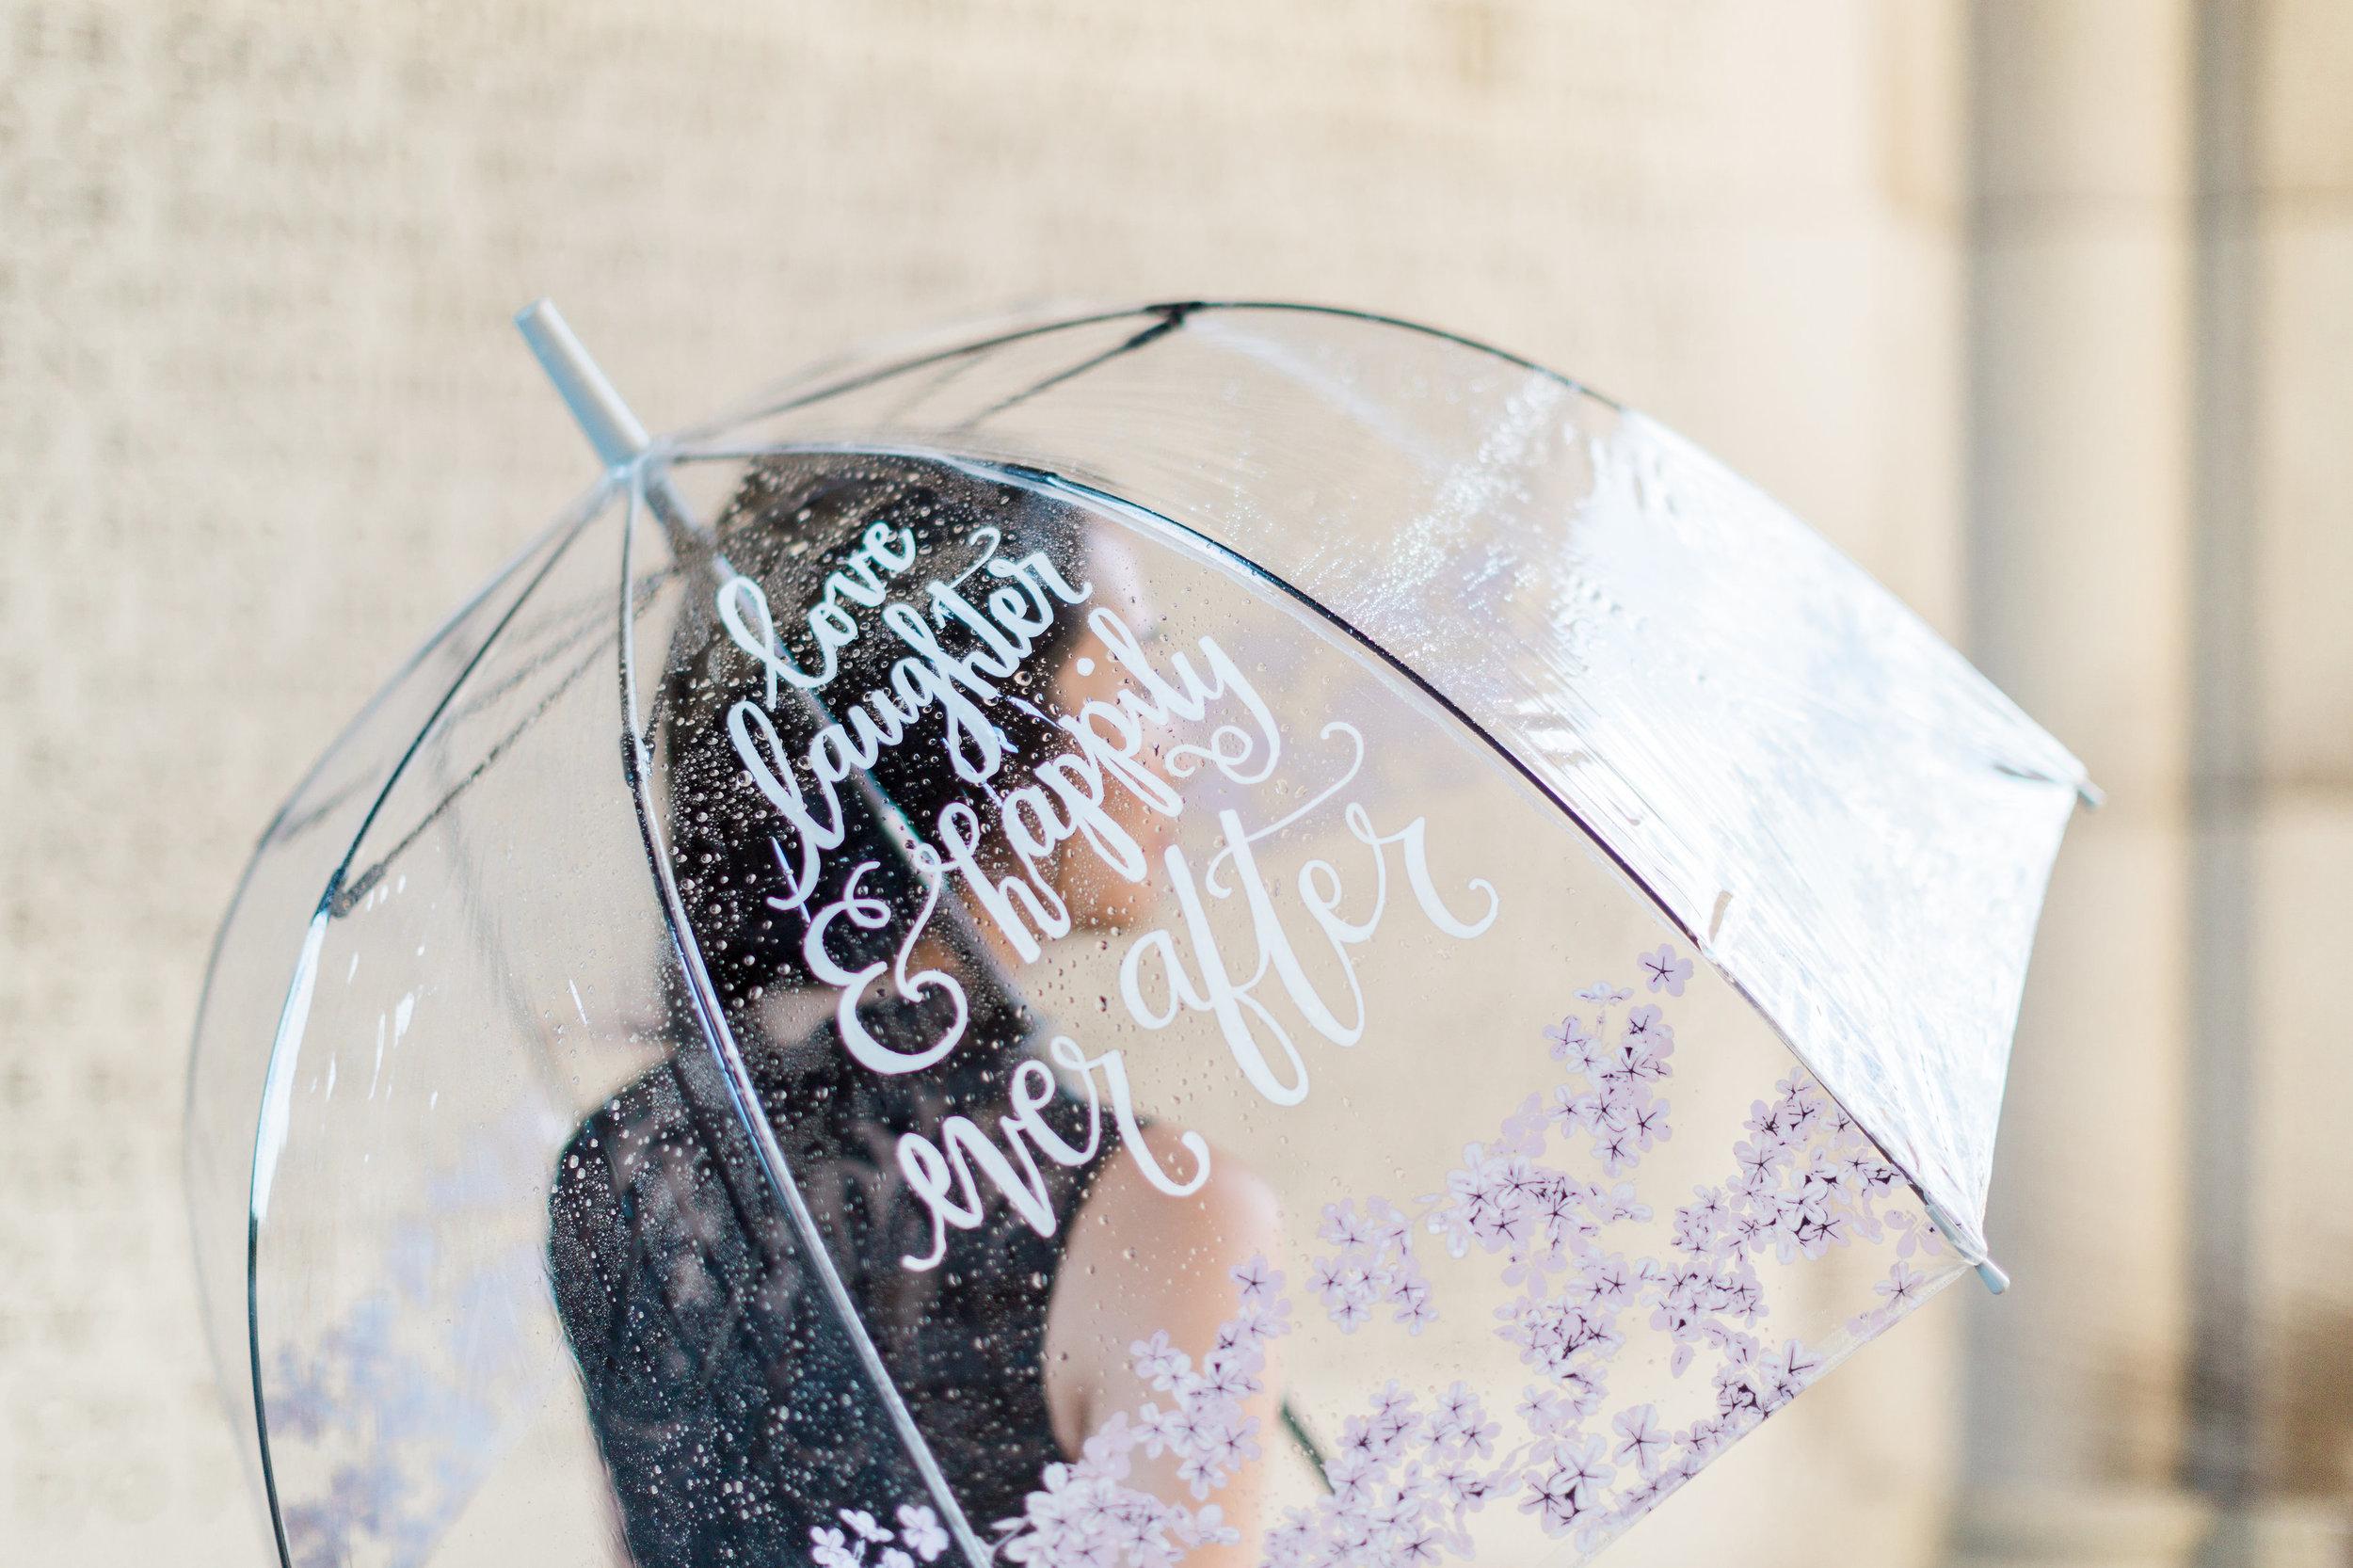 Custom Calligraphy with White Umbrella Co.